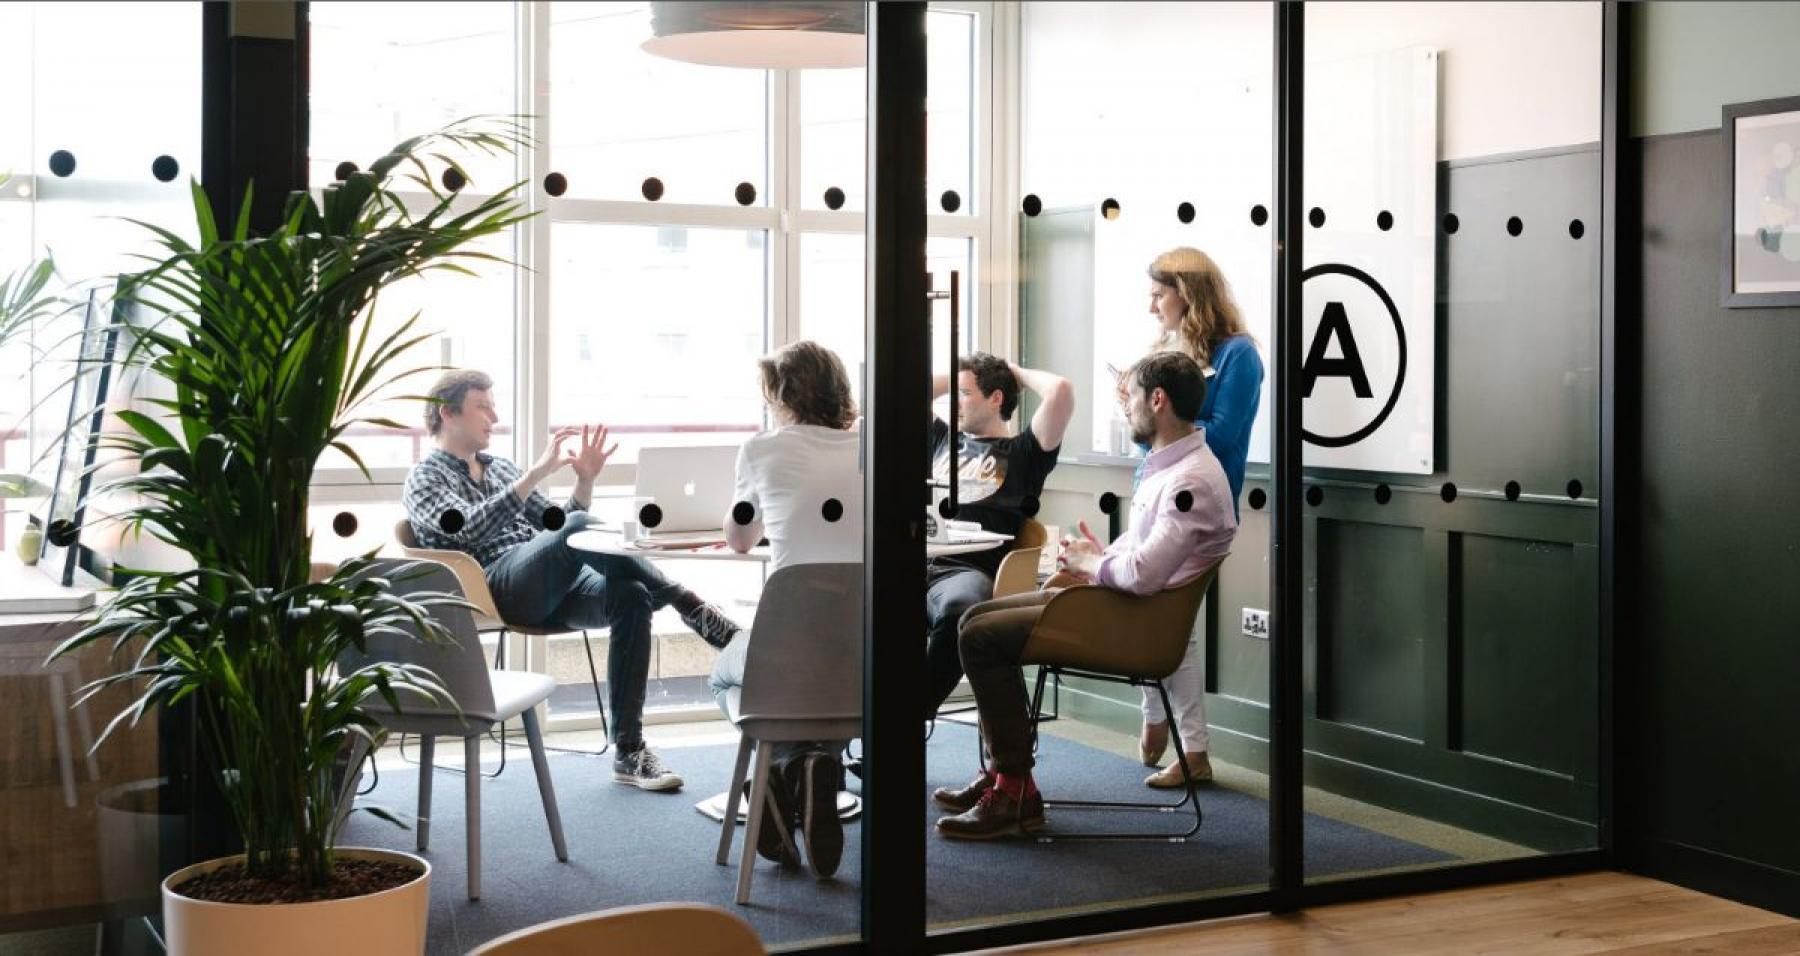 Modernes offenes Büro mieten an der Alexanderstraße in Berlin Mitte